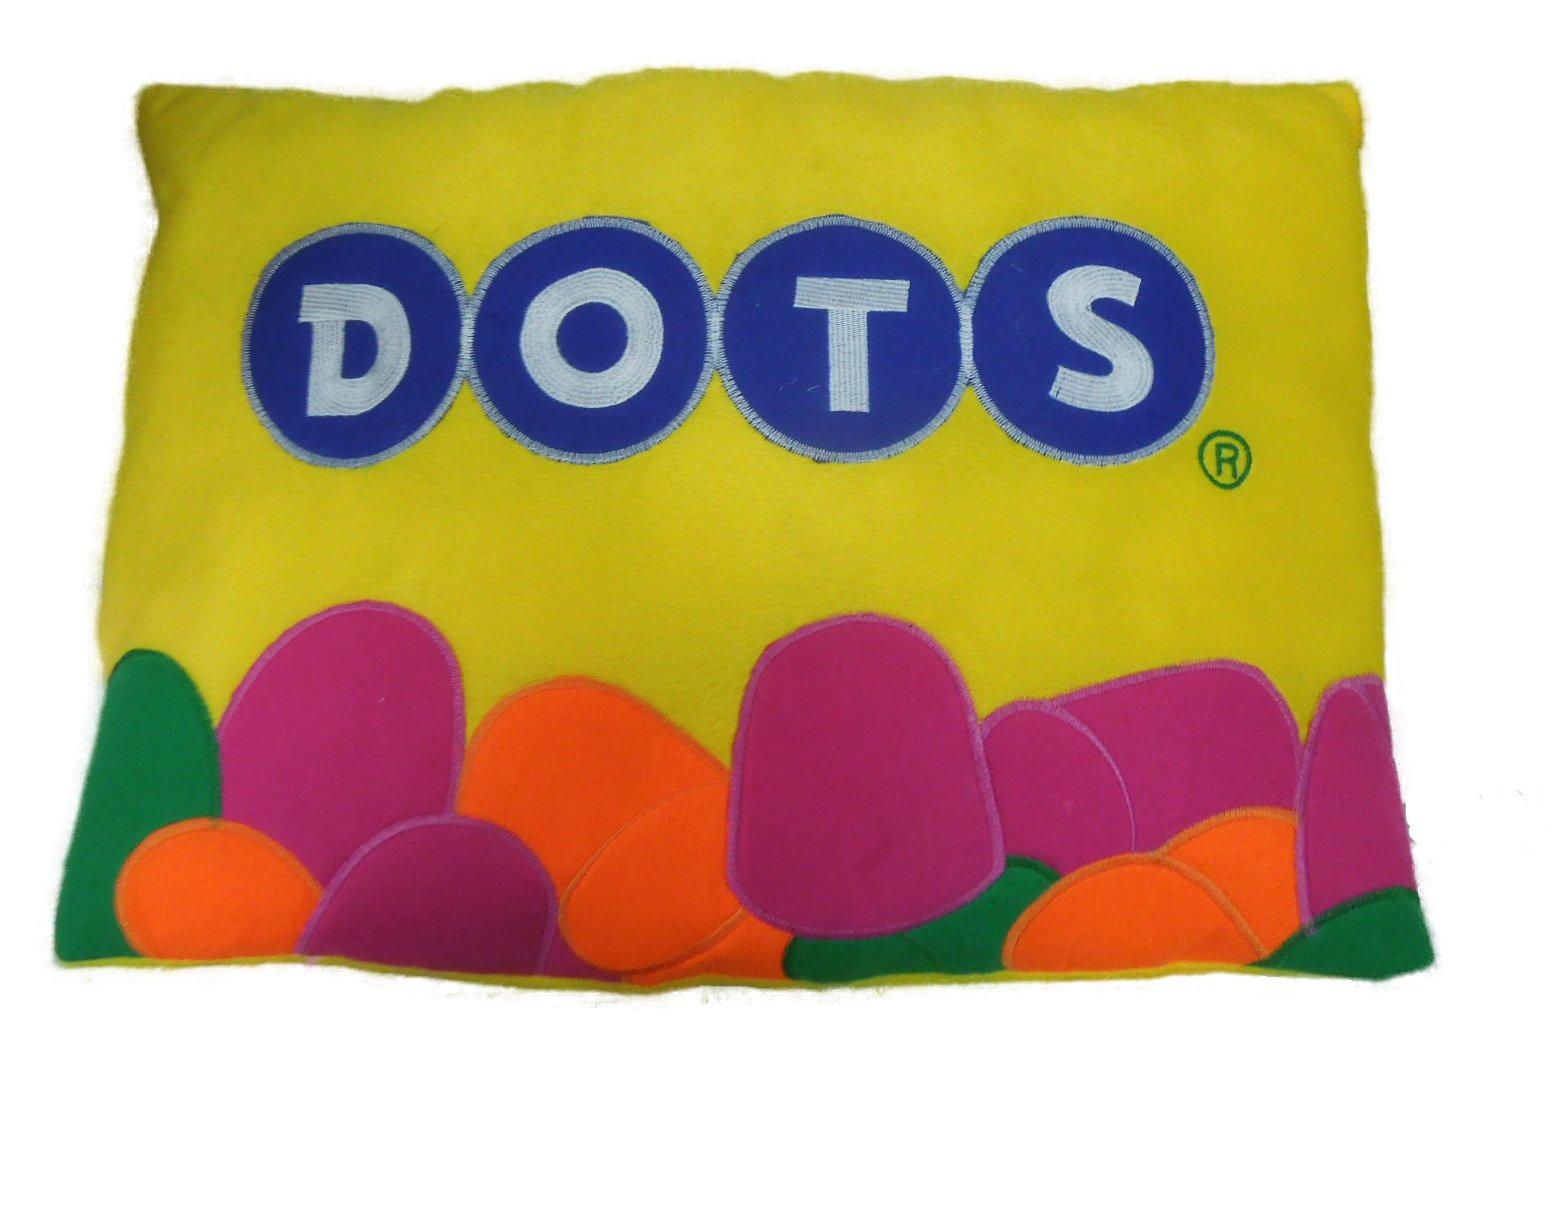 Tootsie Roll Soft Plush Pillow, 30'' (Dots)